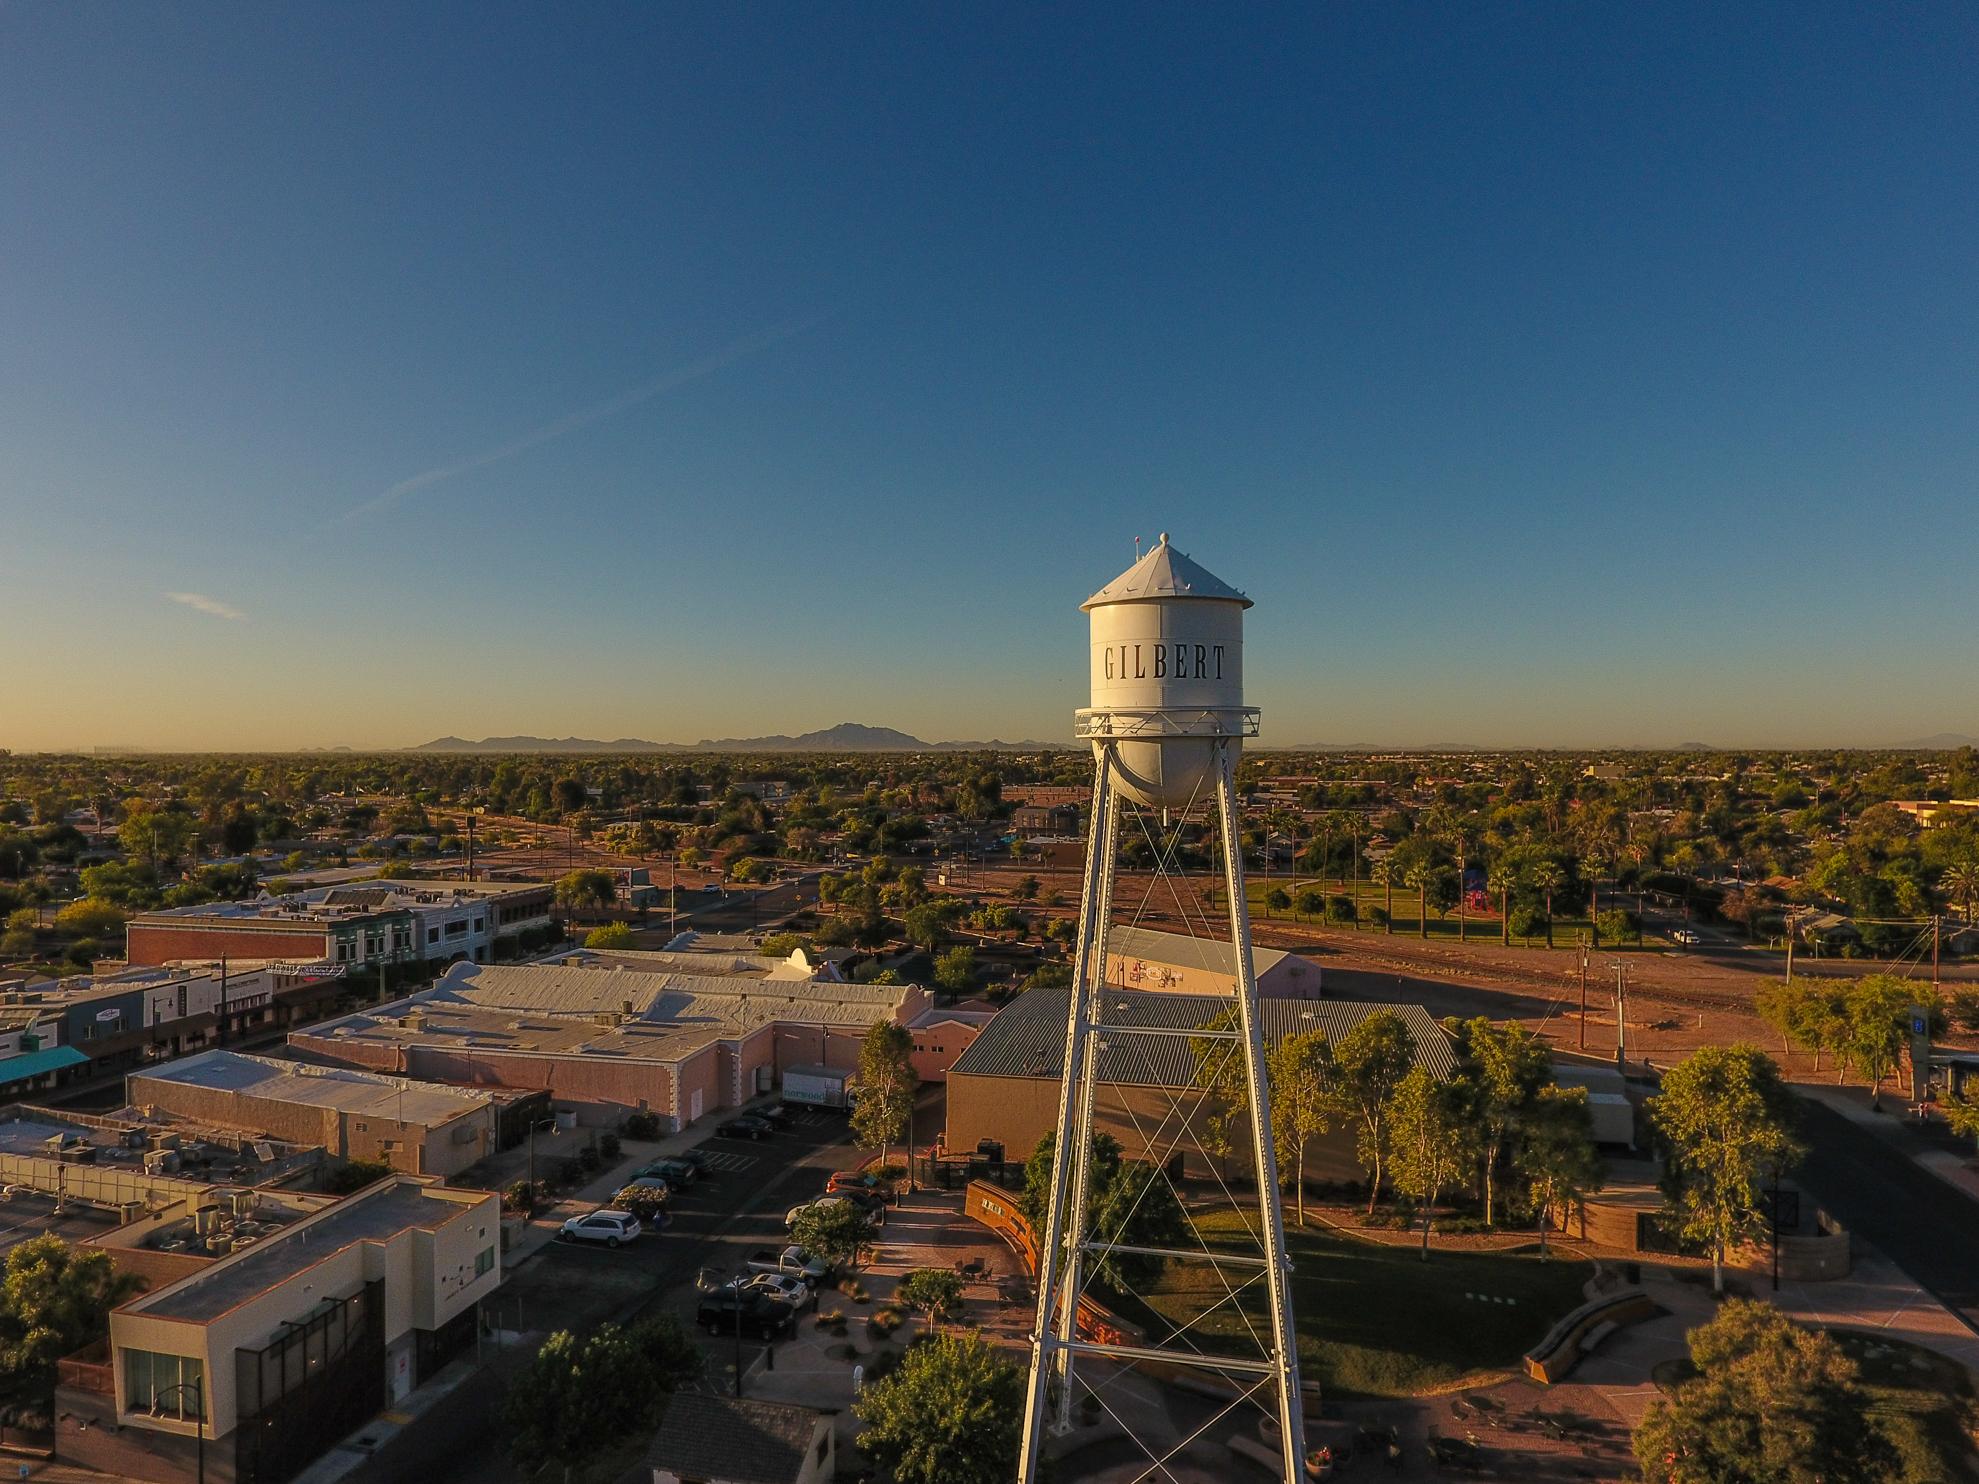 Old Town Gilbert Arizona at Sunrise